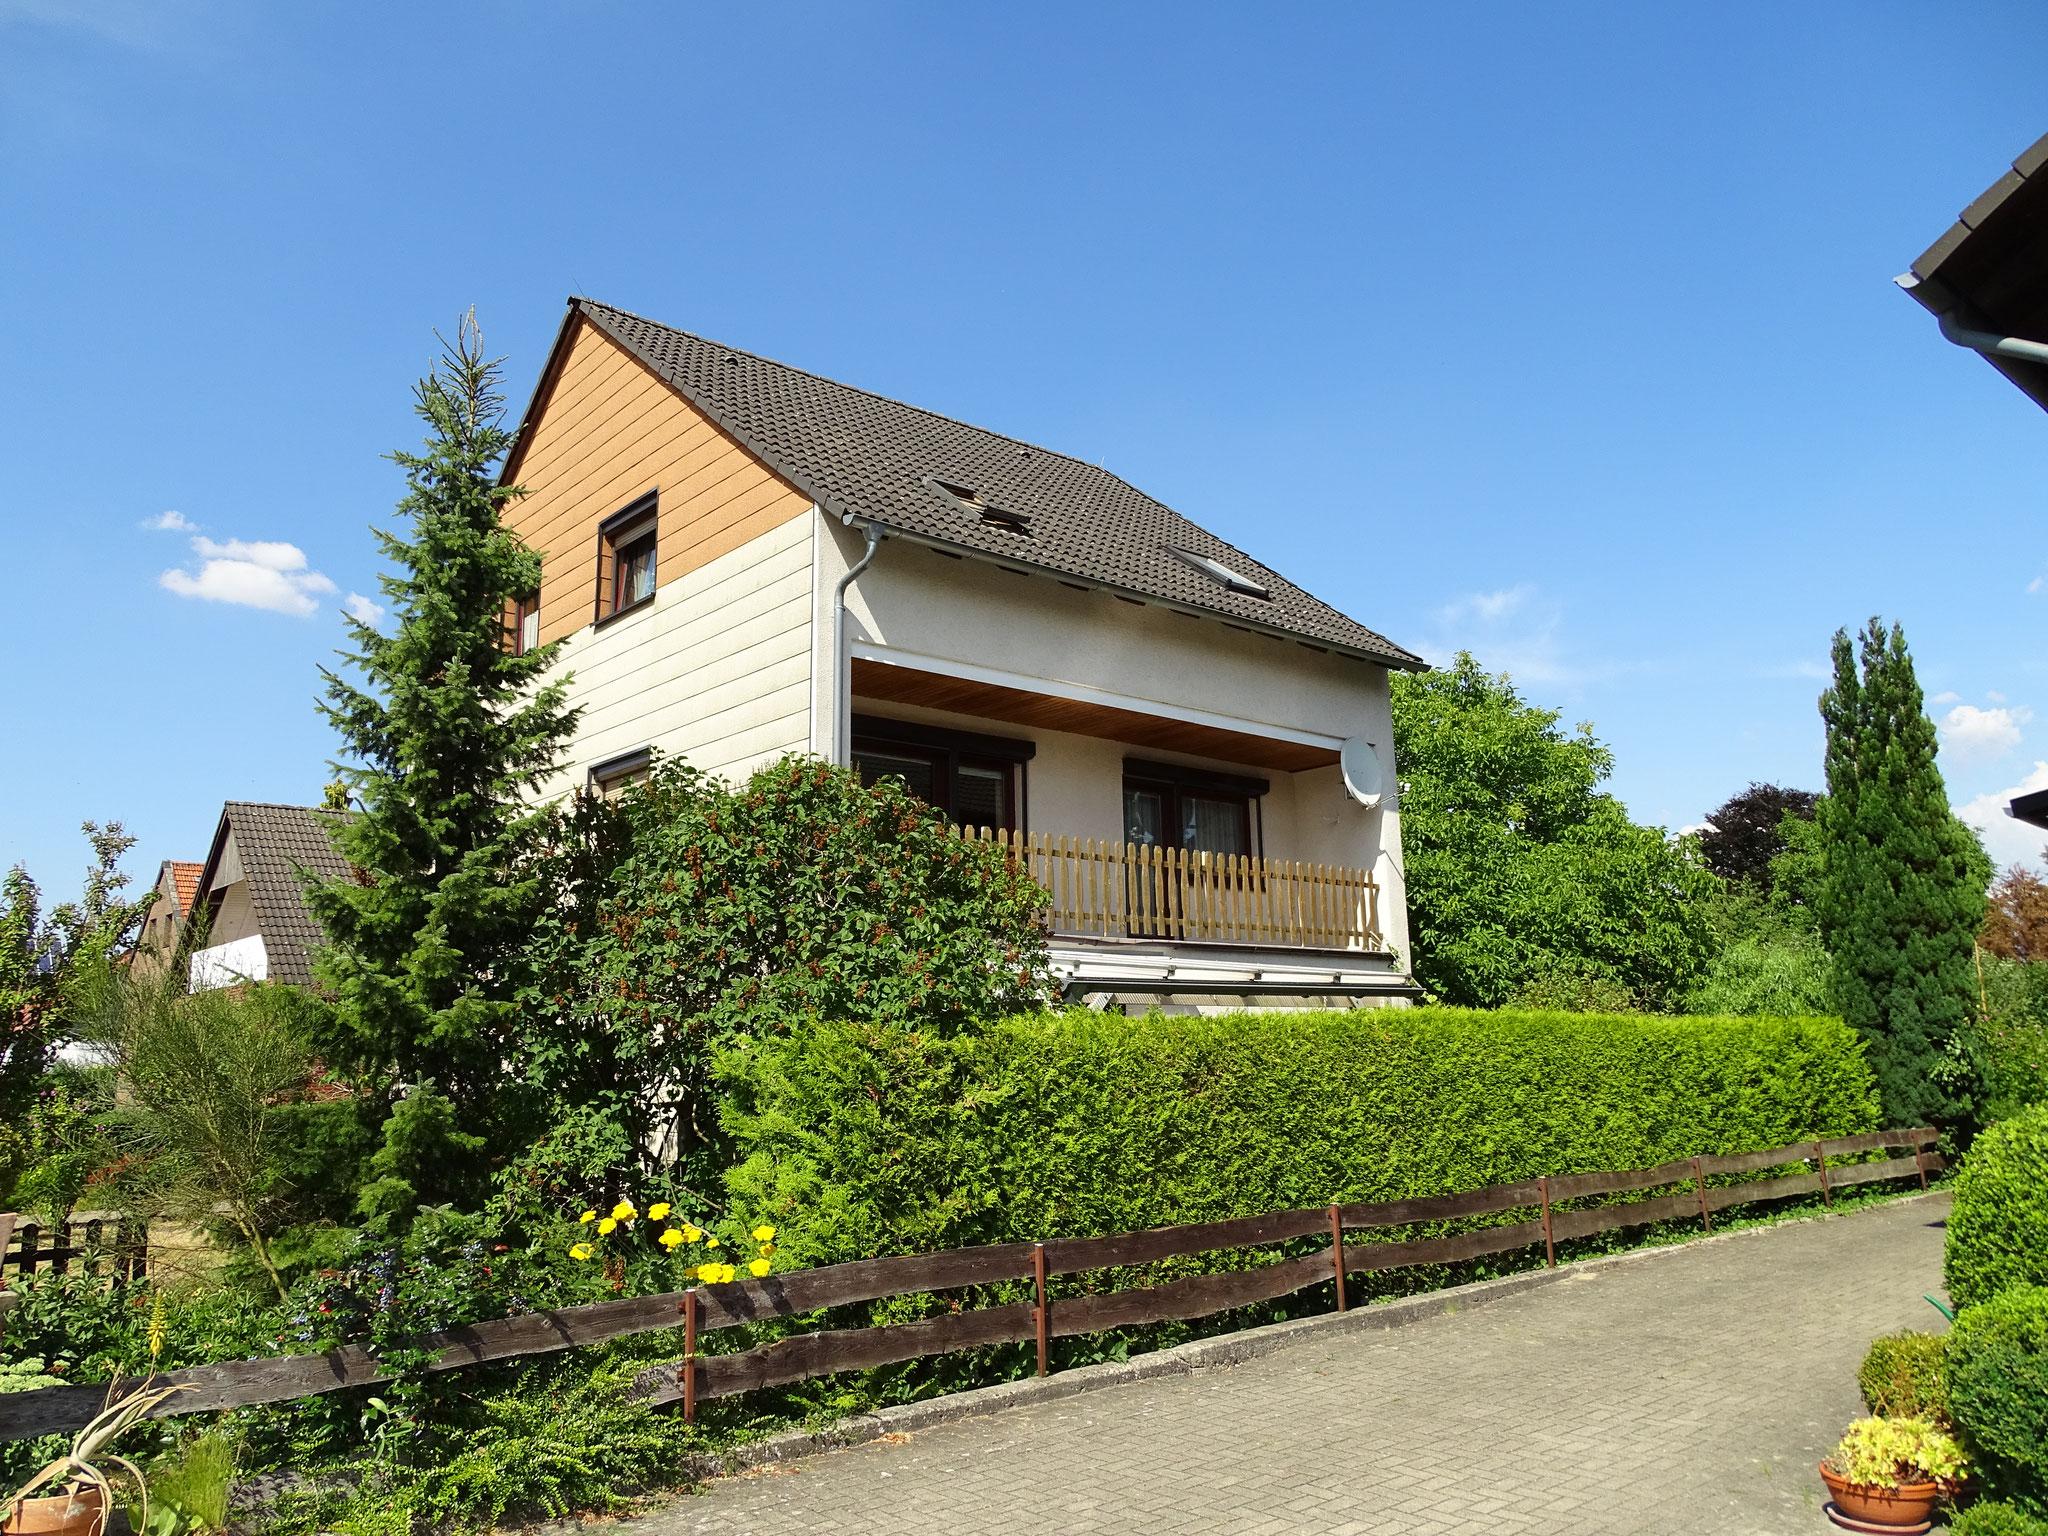 Mehrfamilienhaus verkauft in Vechelde - Vallstedt 2019